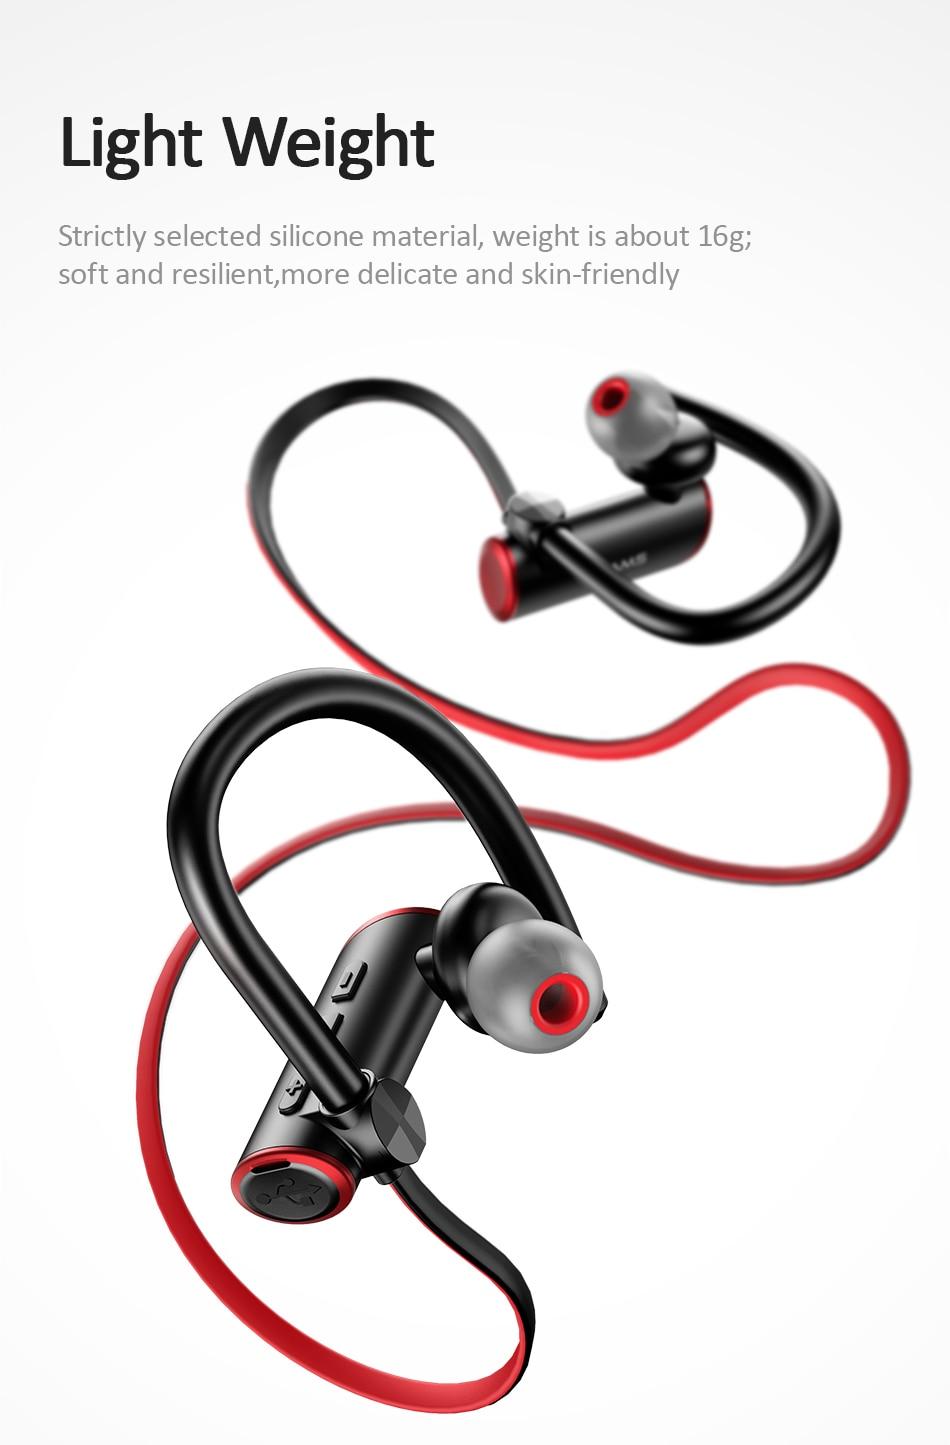 20201010-US-YD004-S4-Sport系列-蓝牙运动耳机-950px_03